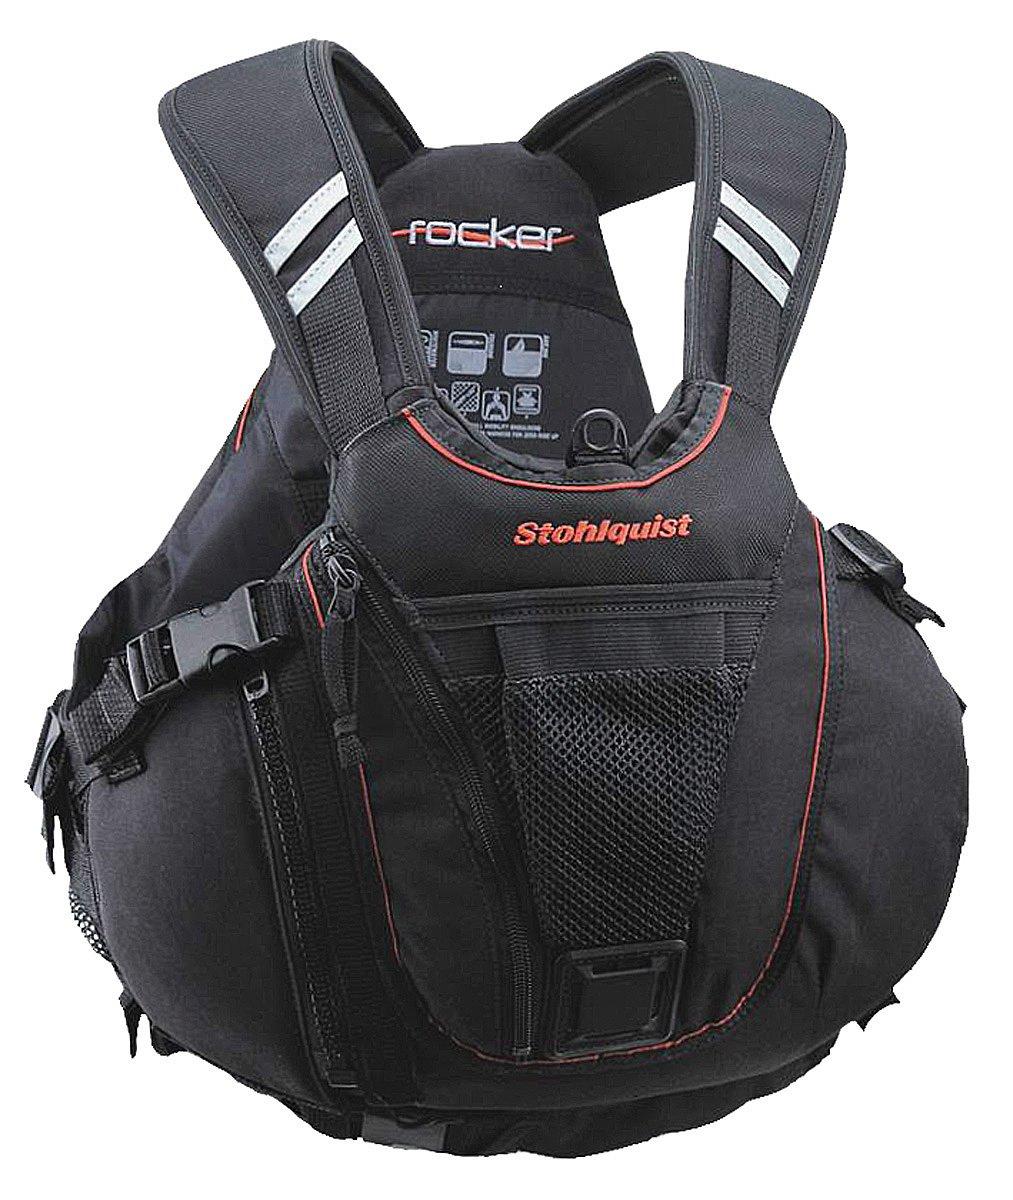 Stohlquist Rocker Personal Floatation Device, Black, XX-Large